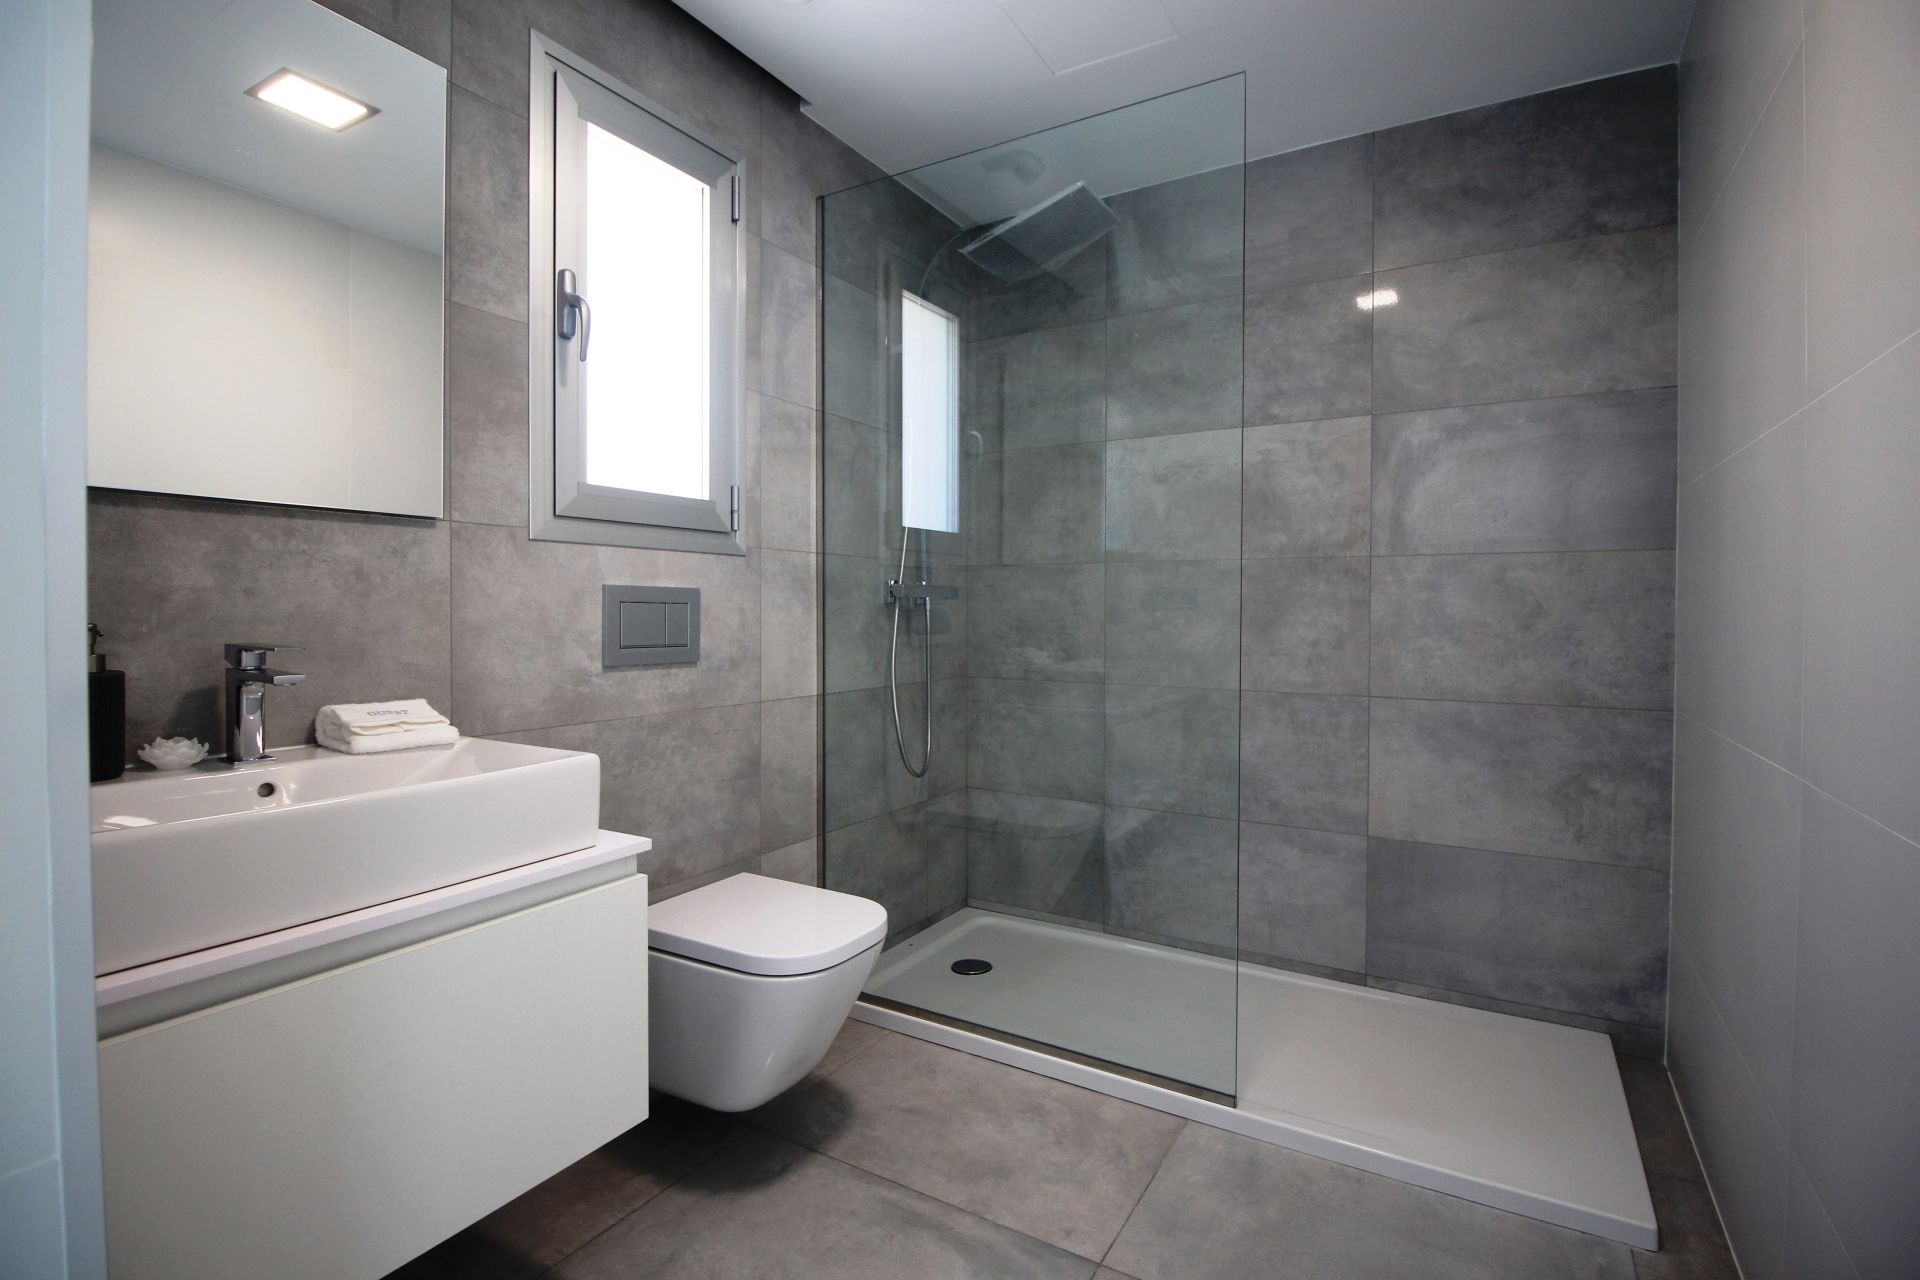 Exclusive villas with 3 bedrooms in Finestrat 4